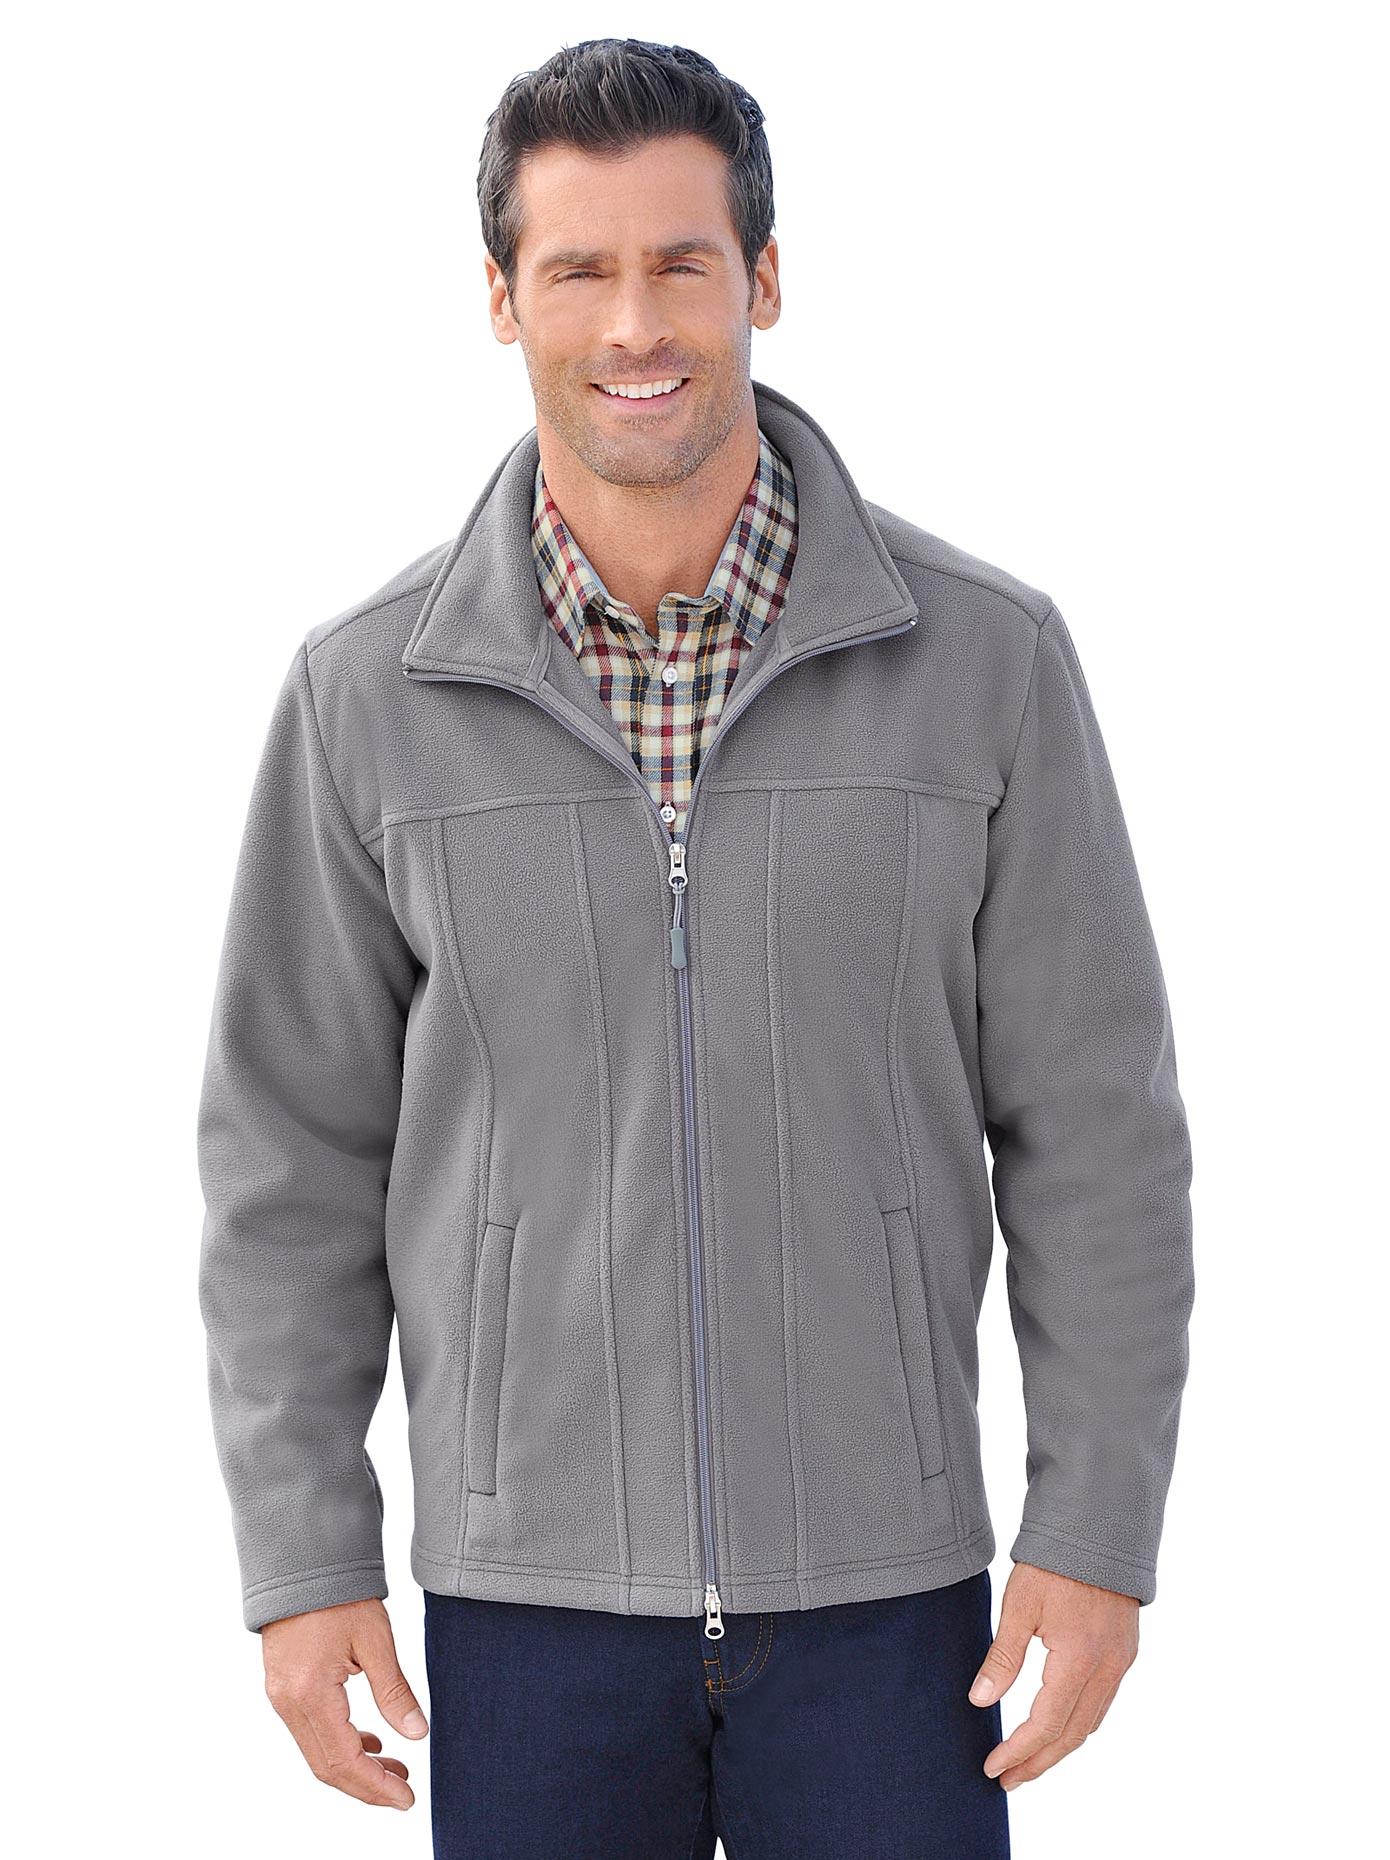 Marco Donati Fleece-Jacke mit Reißverschluss | Bekleidung > Jacken > Fleecejacken | Grau | Fleece | MARCO DONATI